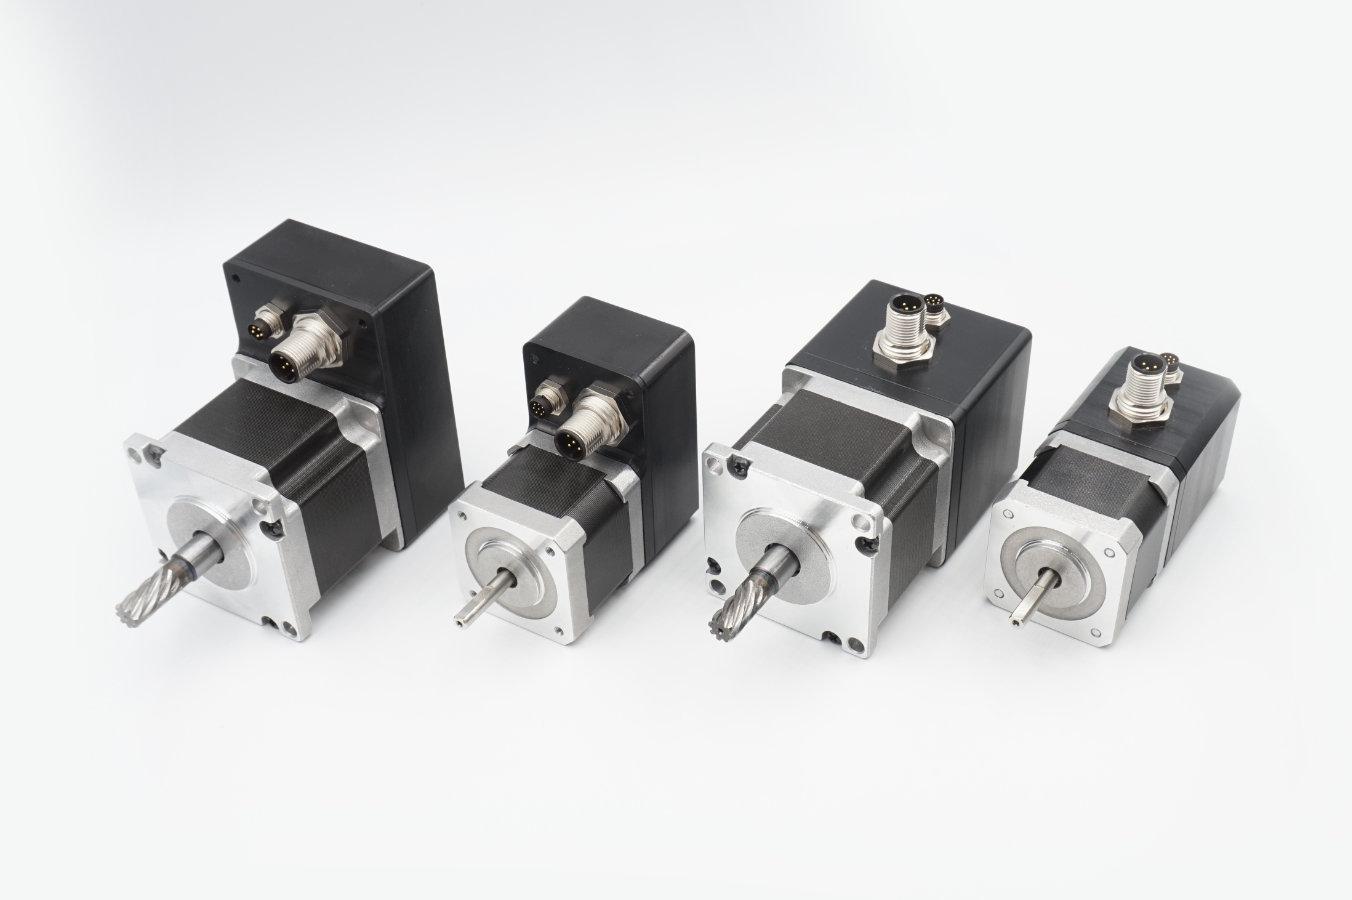 Robuste Schrittmotoren in industrieller Ausführung